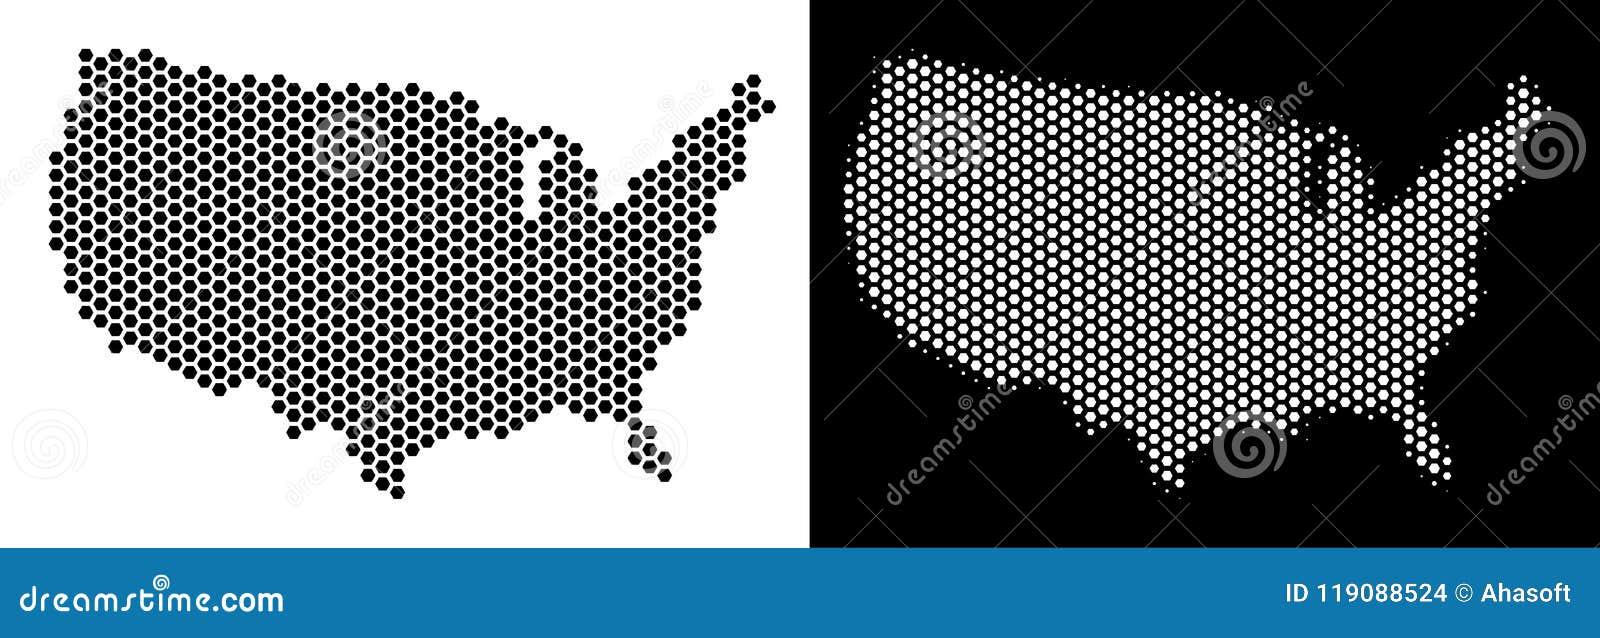 USA Map Hexagon Scheme stock vector. Illustration of mosaic ...